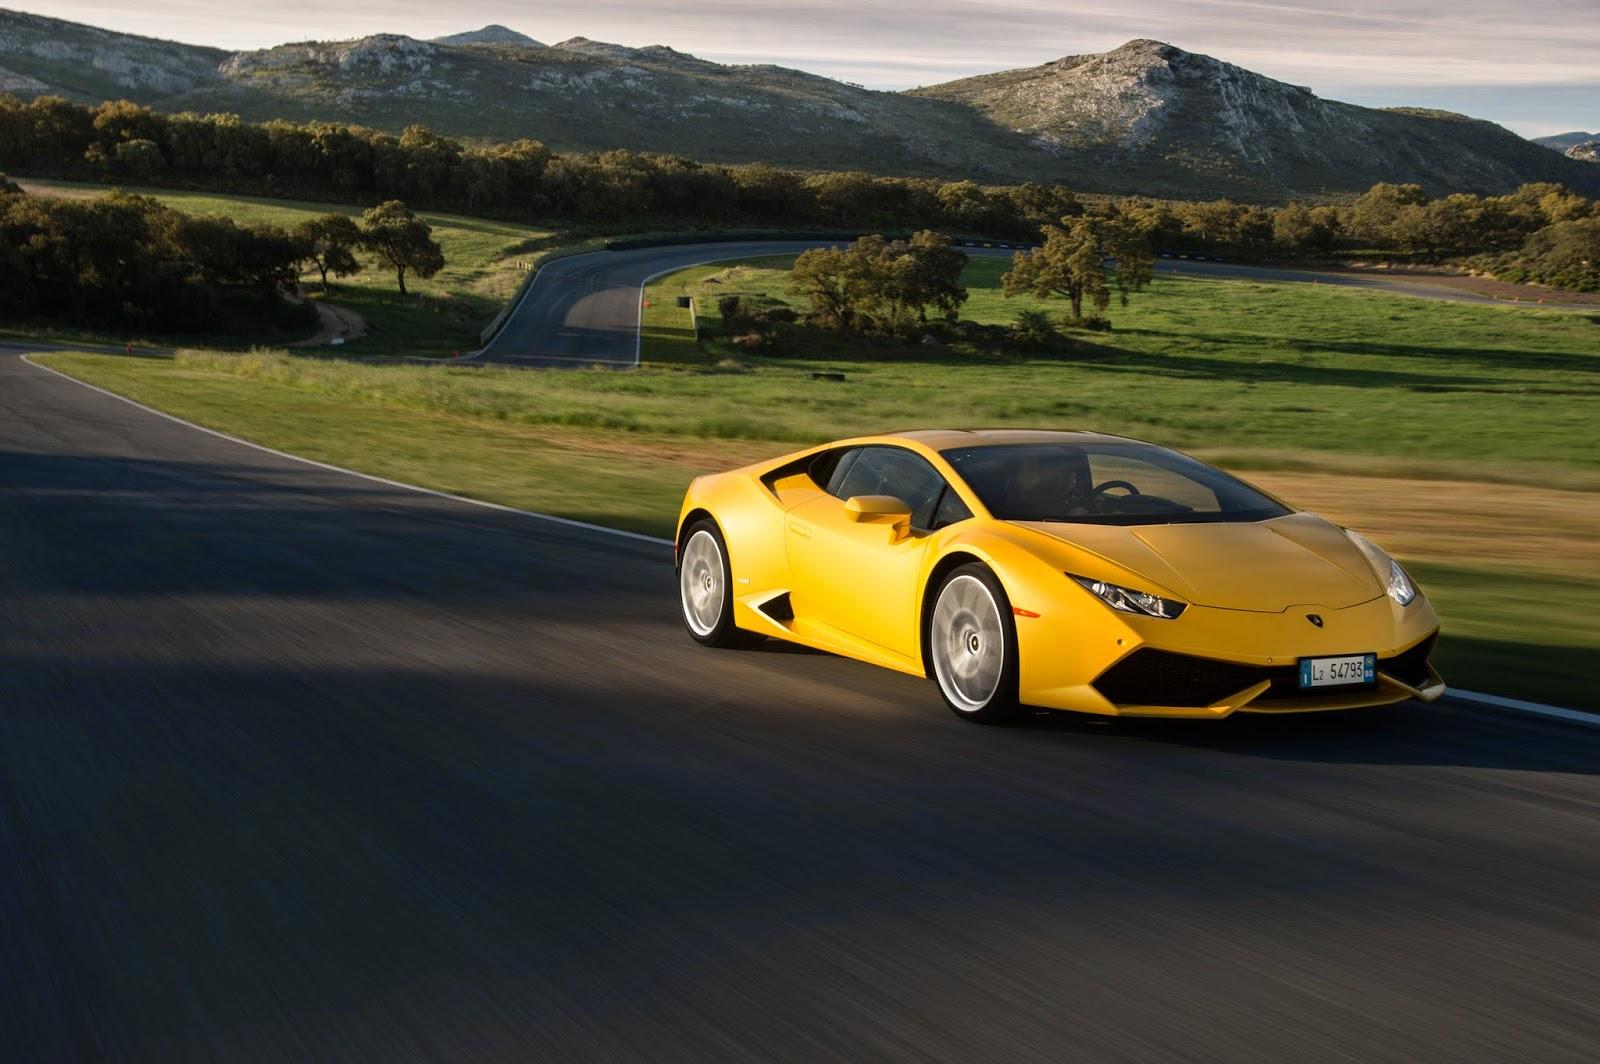 Lamborghini Huracan LP 610-4 HD Image